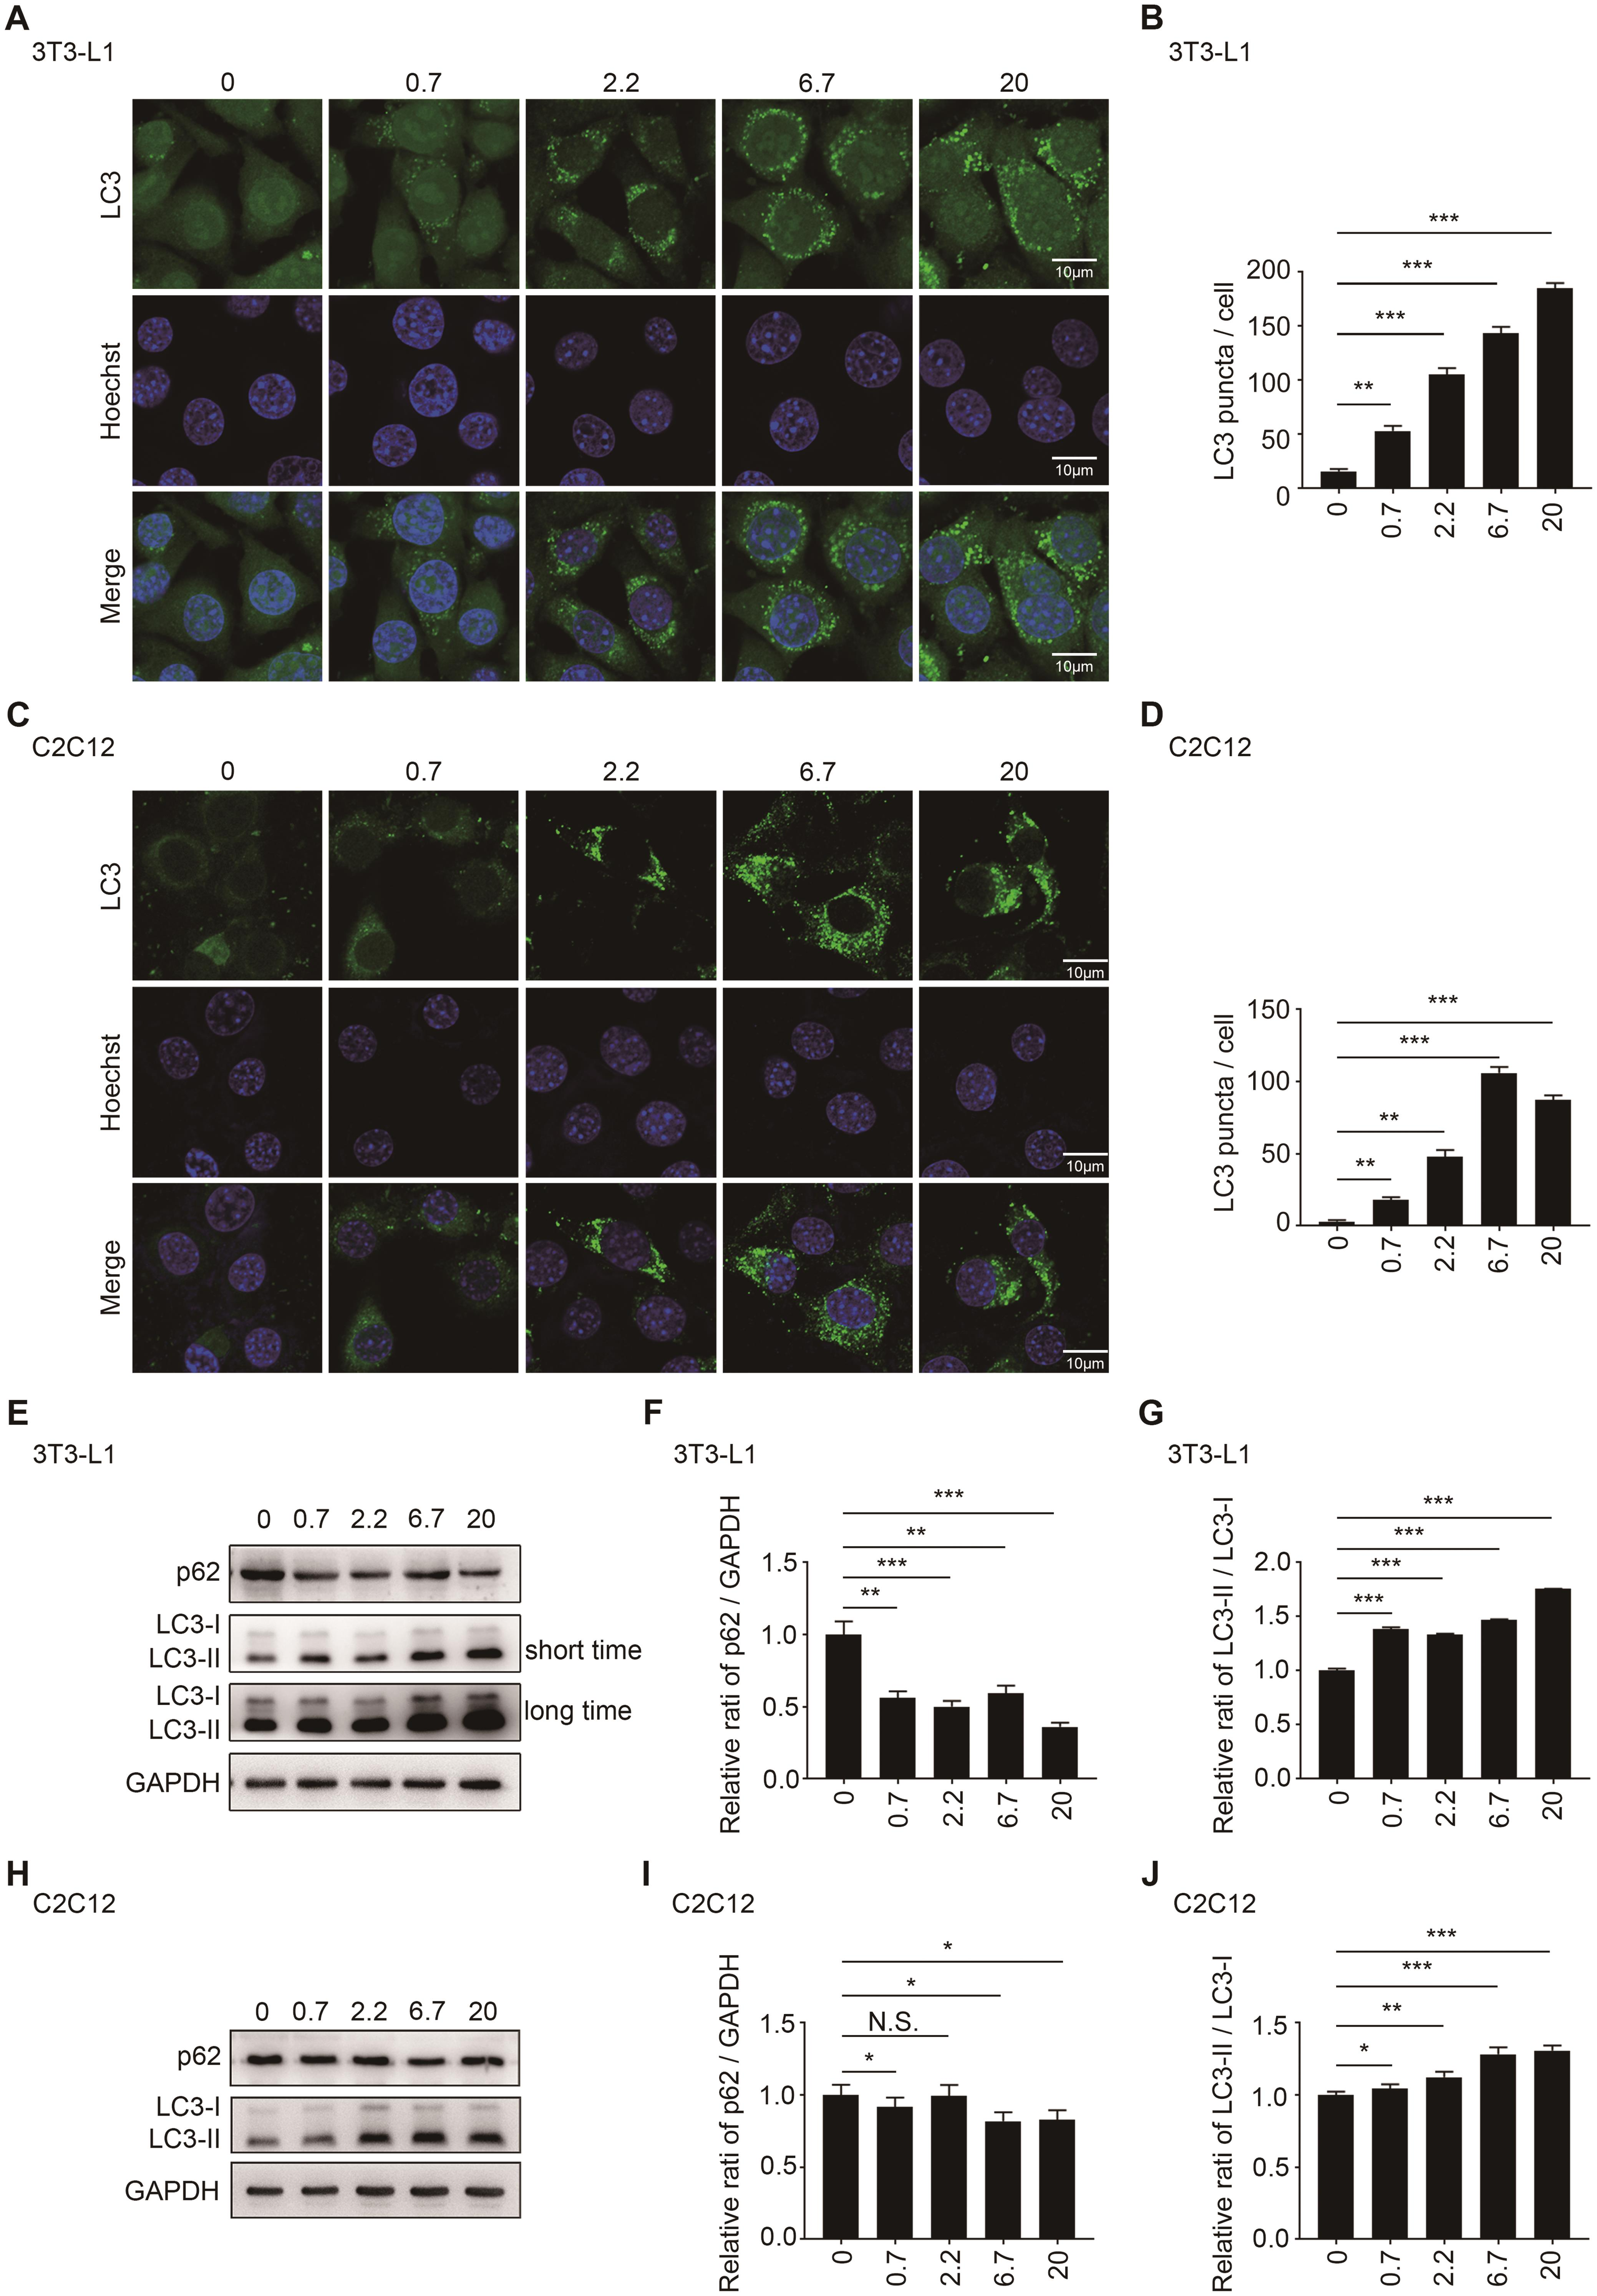 Icaritin promoted autophagy in 3T3-L1 preadipocytes and C2C12 myoblasts.